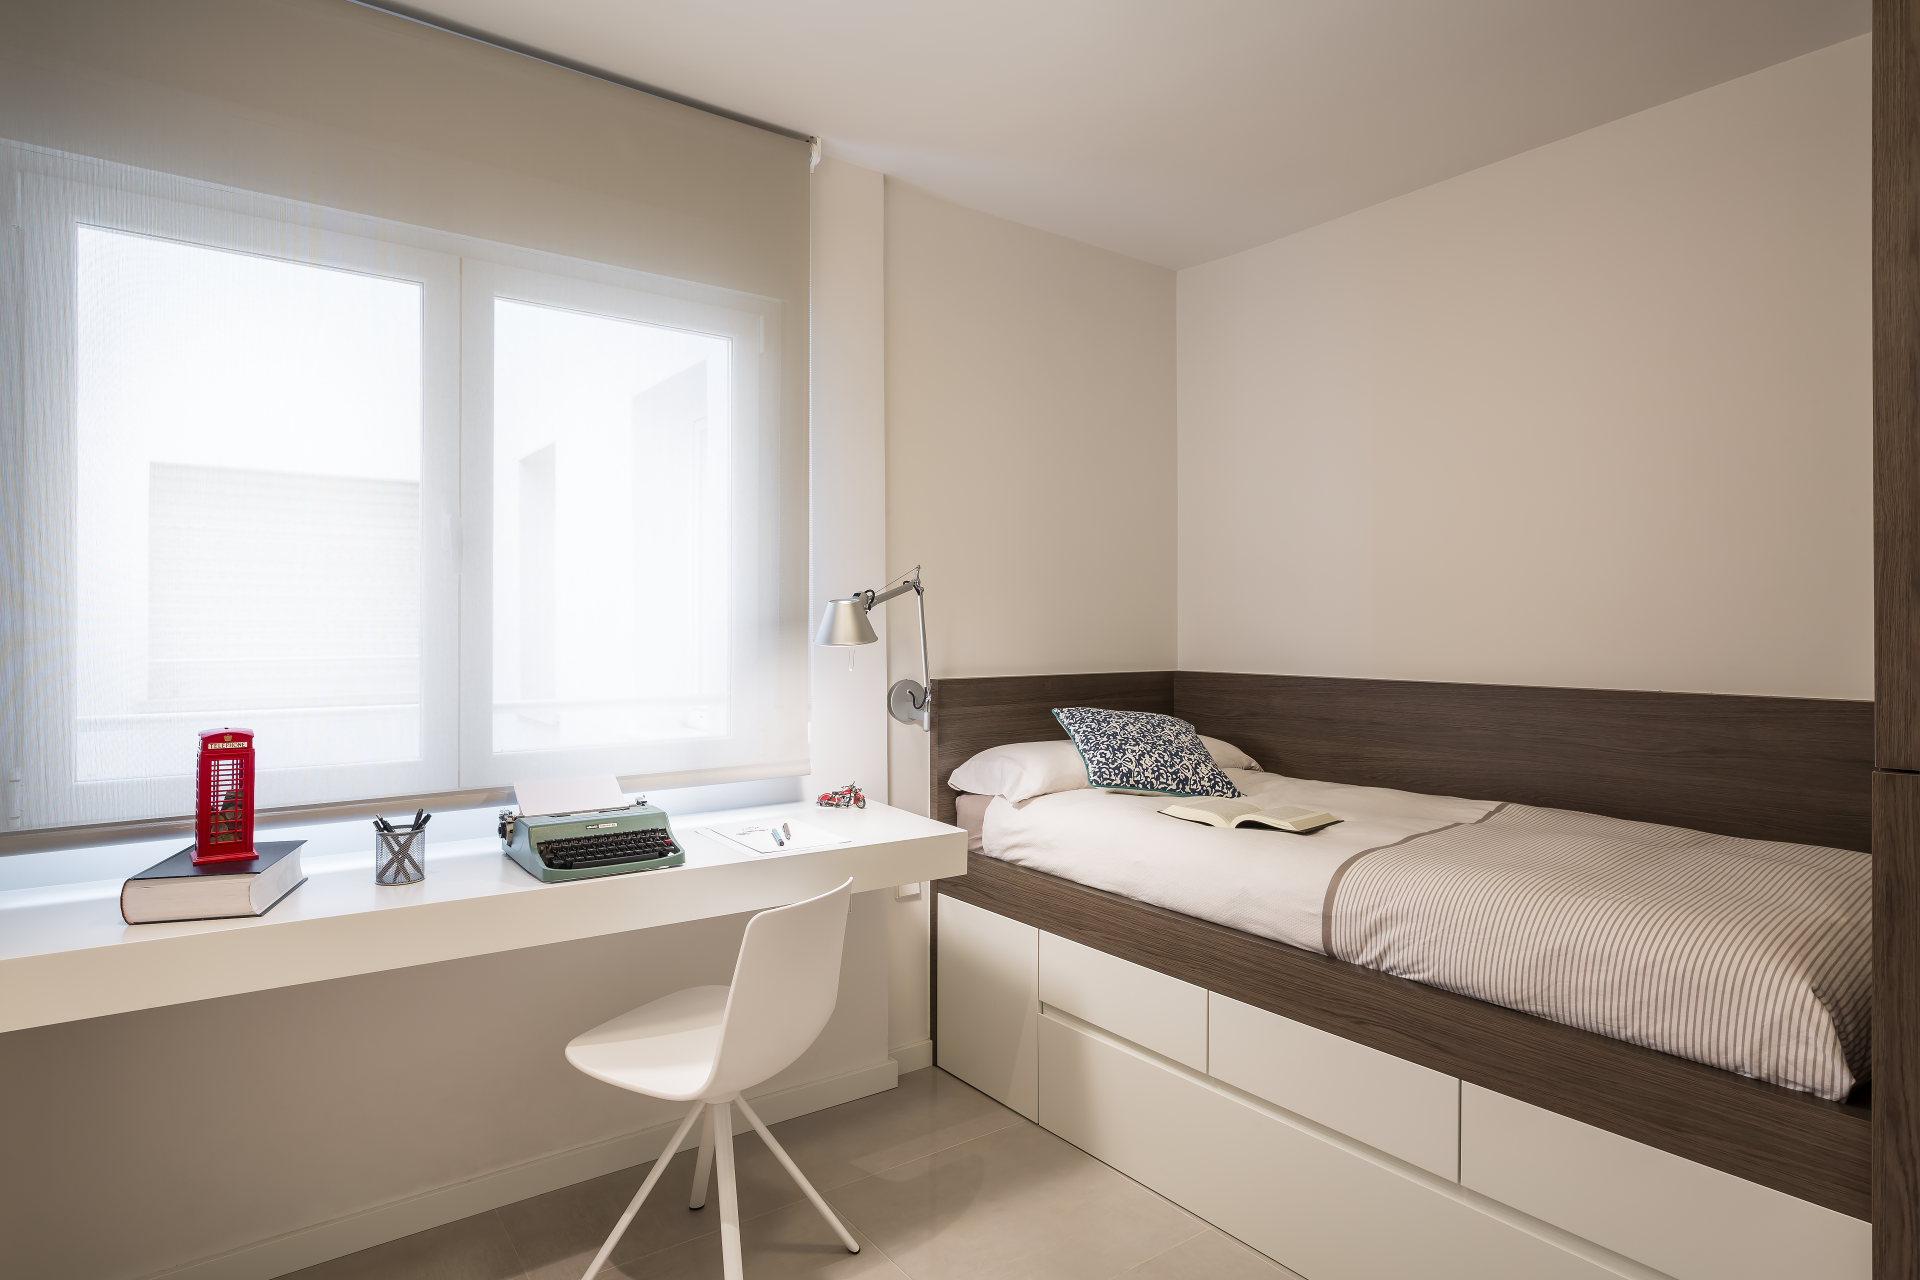 fotografia-arquitectura-interiorismo-valencia-fenollar-german-cabo-laura-yerpes  (26)